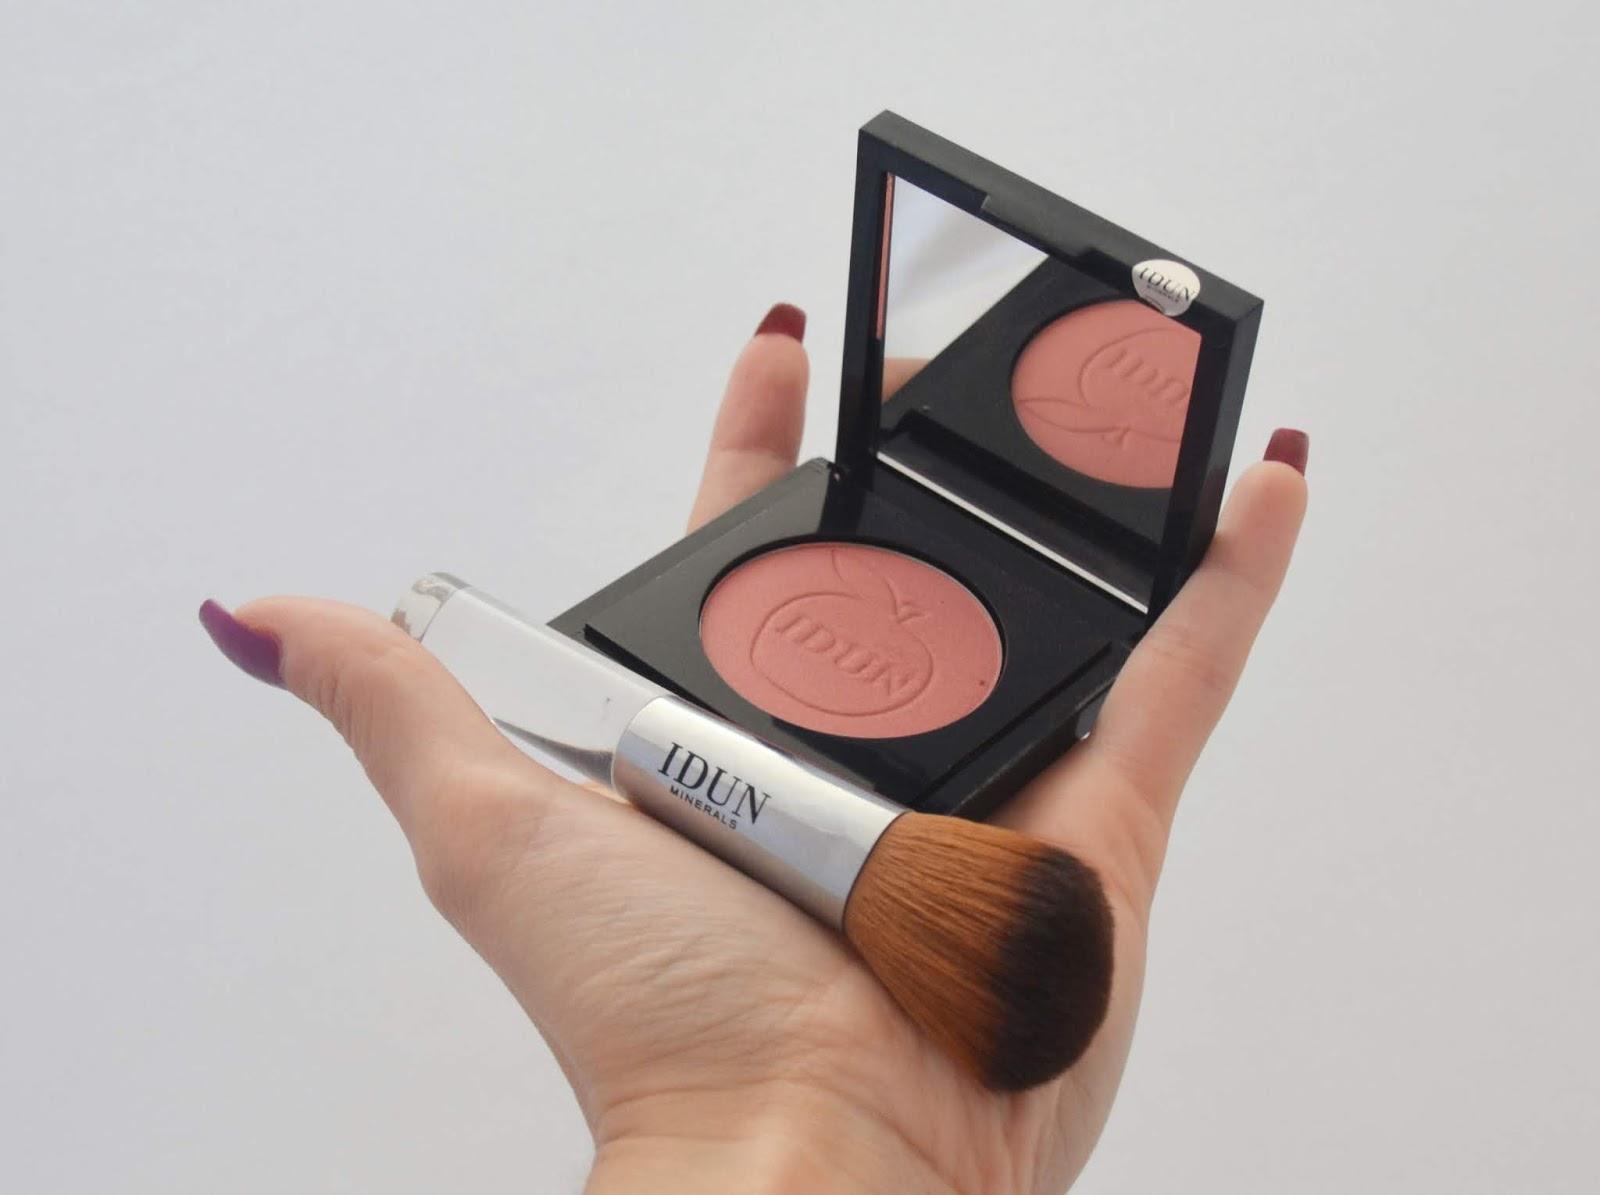 idun-minerals-smultron-blush-brush